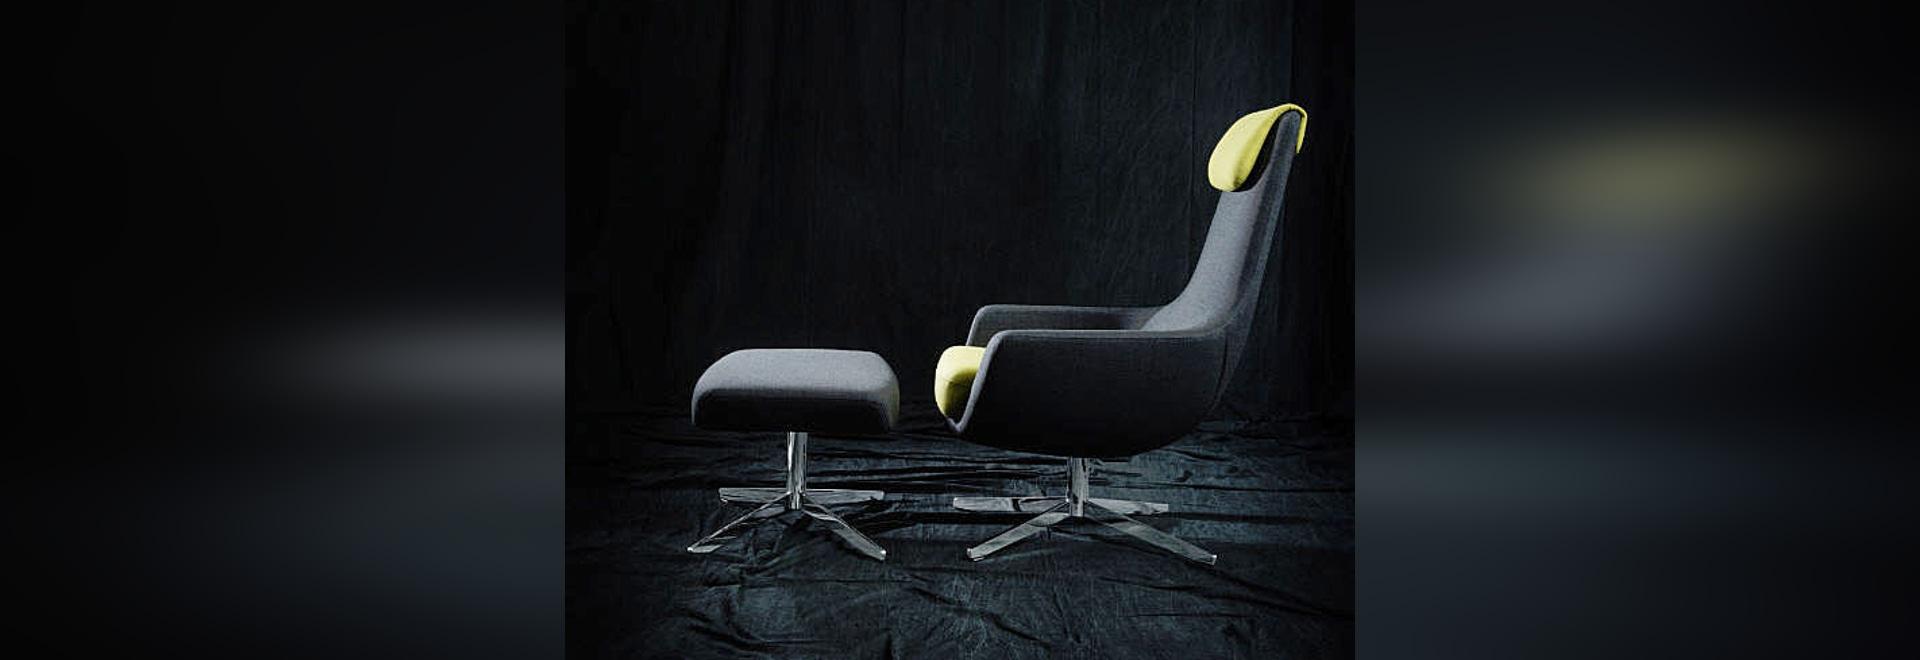 LOU awarded for high design quality